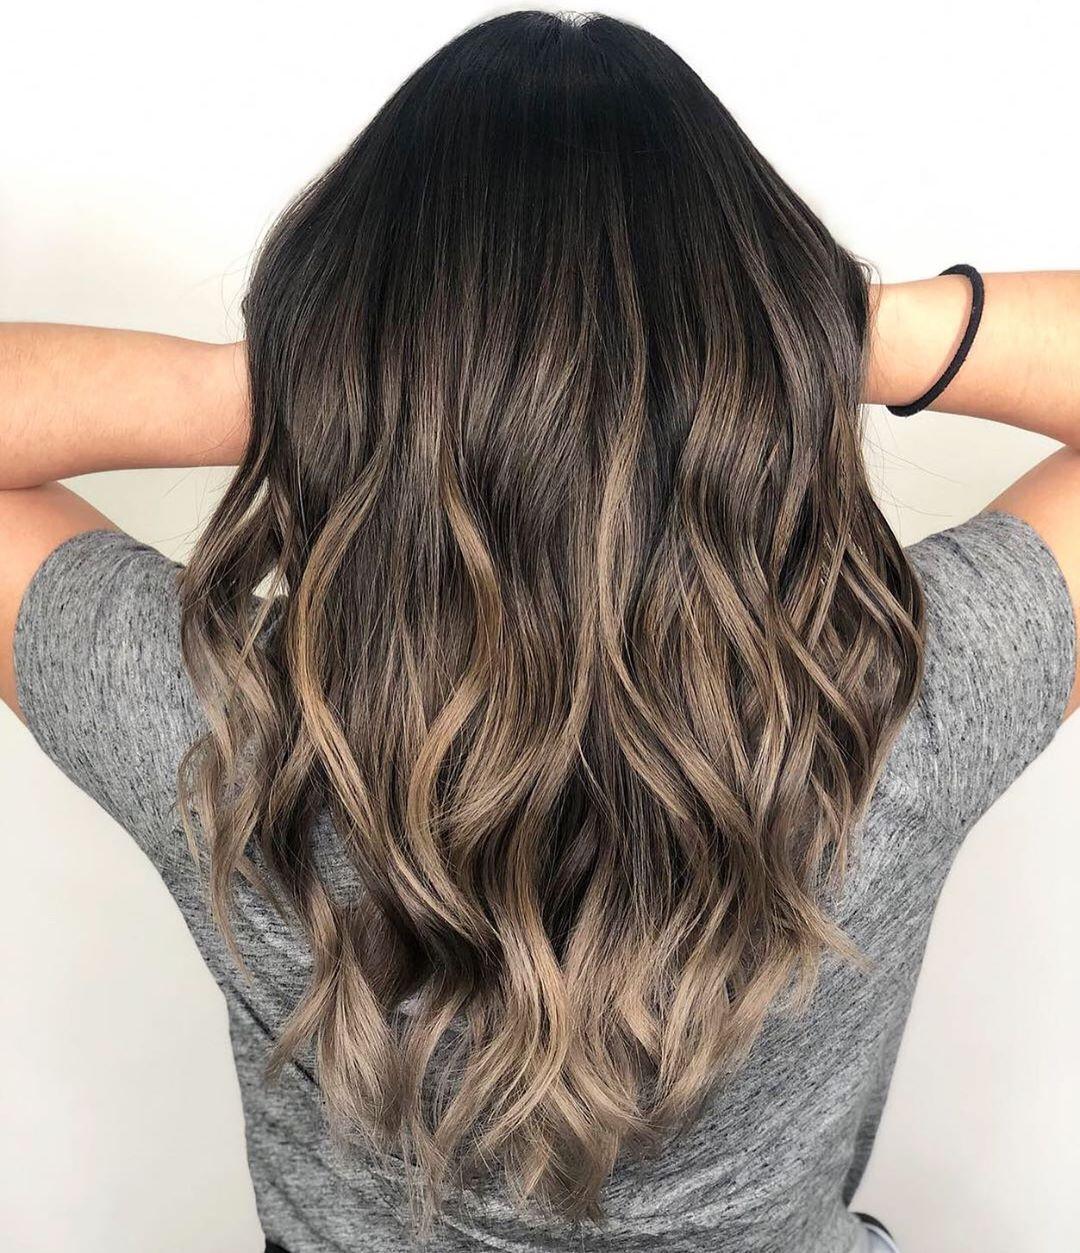 30 Stunning Ash Blonde Hair Ideas to Try in 2020 – Hair Adviser